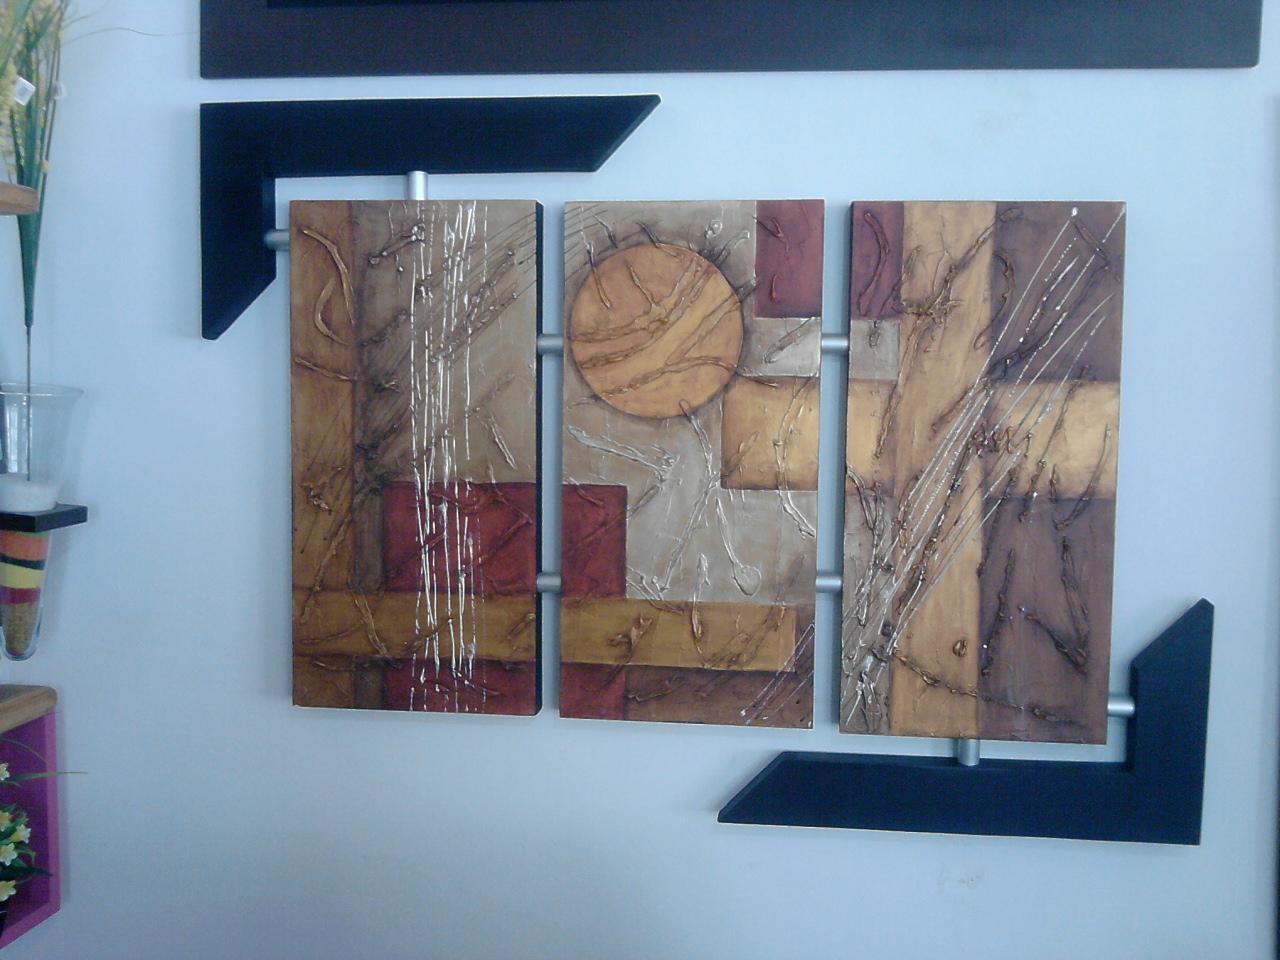 Taller de manualidades decorarte im genes de cuadros for Decoracion hogar 2012